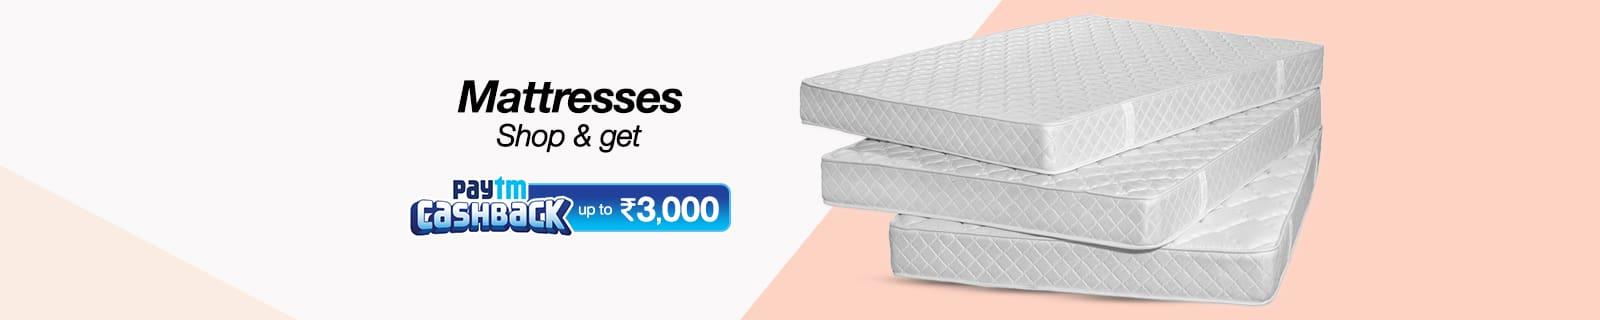 Mattress Flat 25% cashback